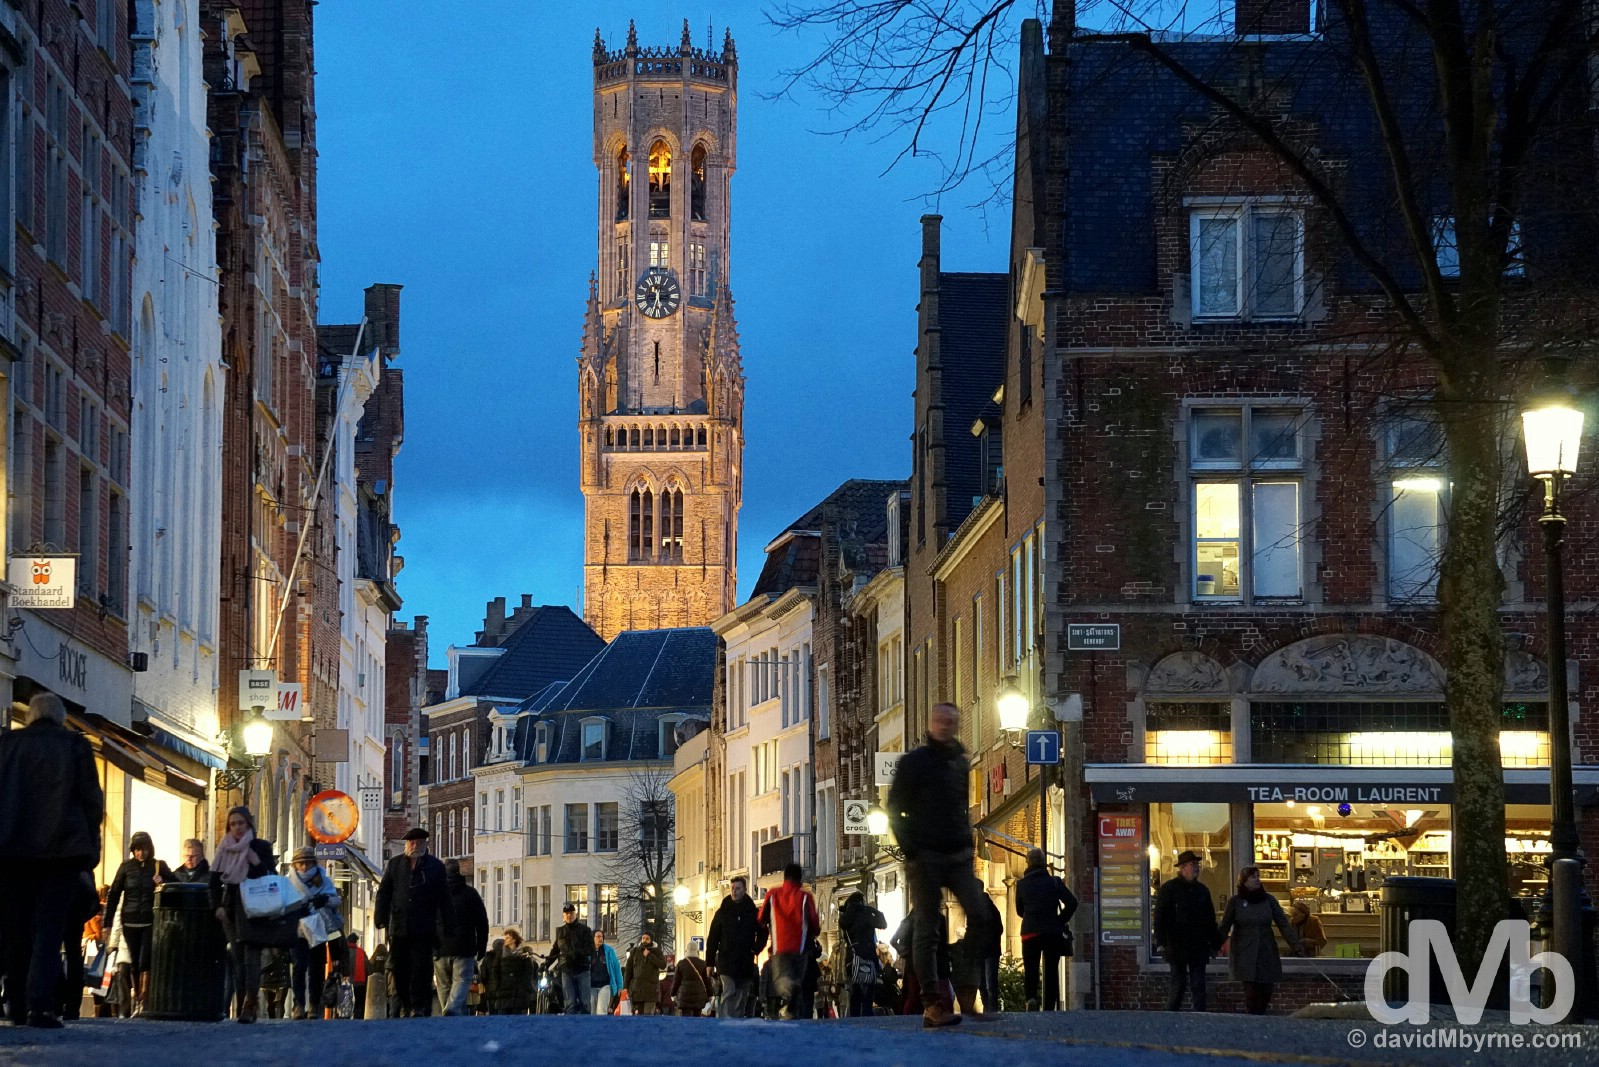 The Belfort at dusk as seen from as seen from Steenstr in Bruges, western Flanders, Belgium. January 16, 2015.